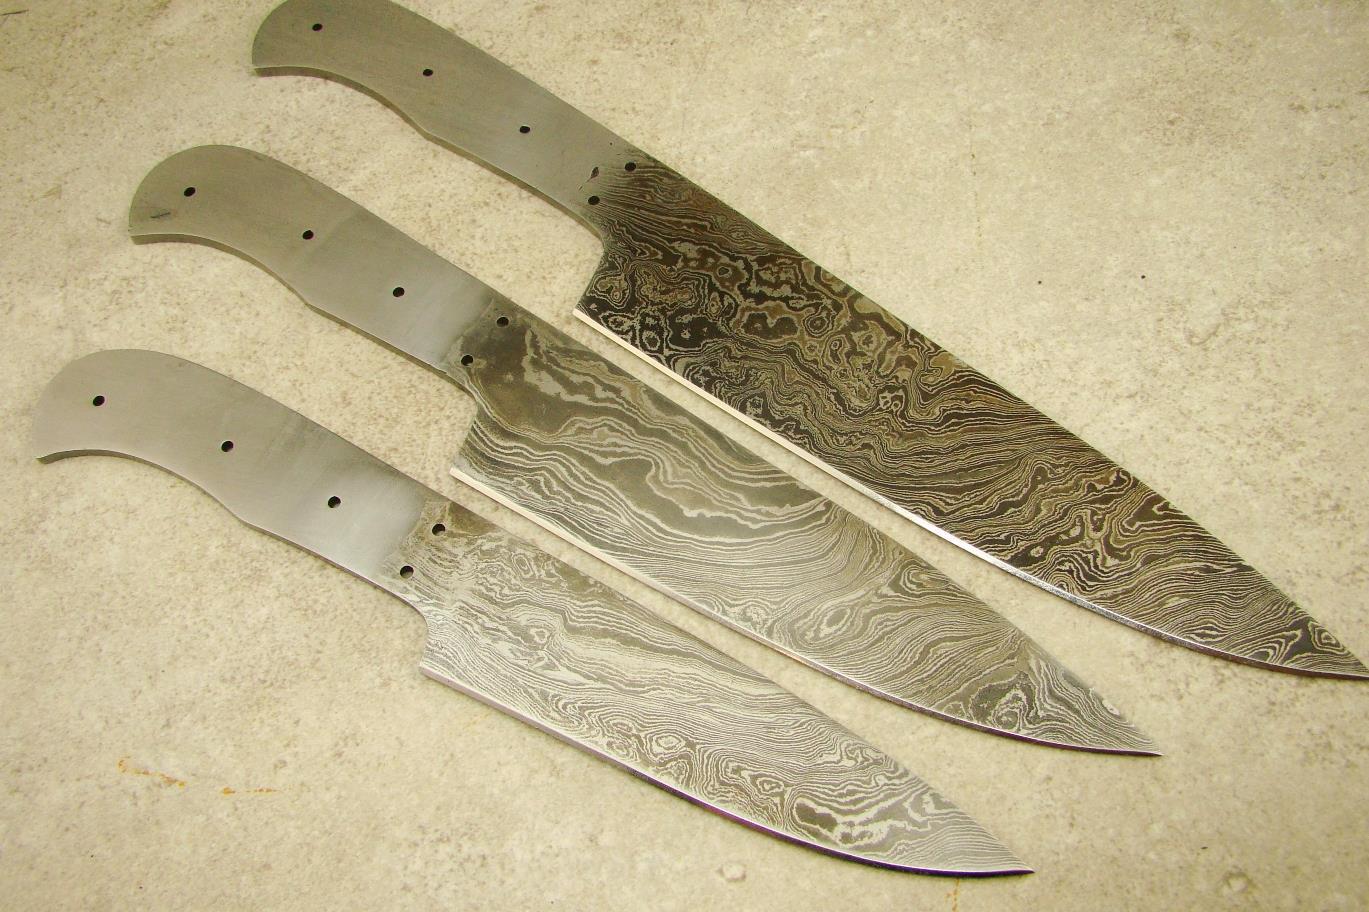 3pc professional chef knife set custom damascus blank knifemaking ckset 51 ebay. Black Bedroom Furniture Sets. Home Design Ideas